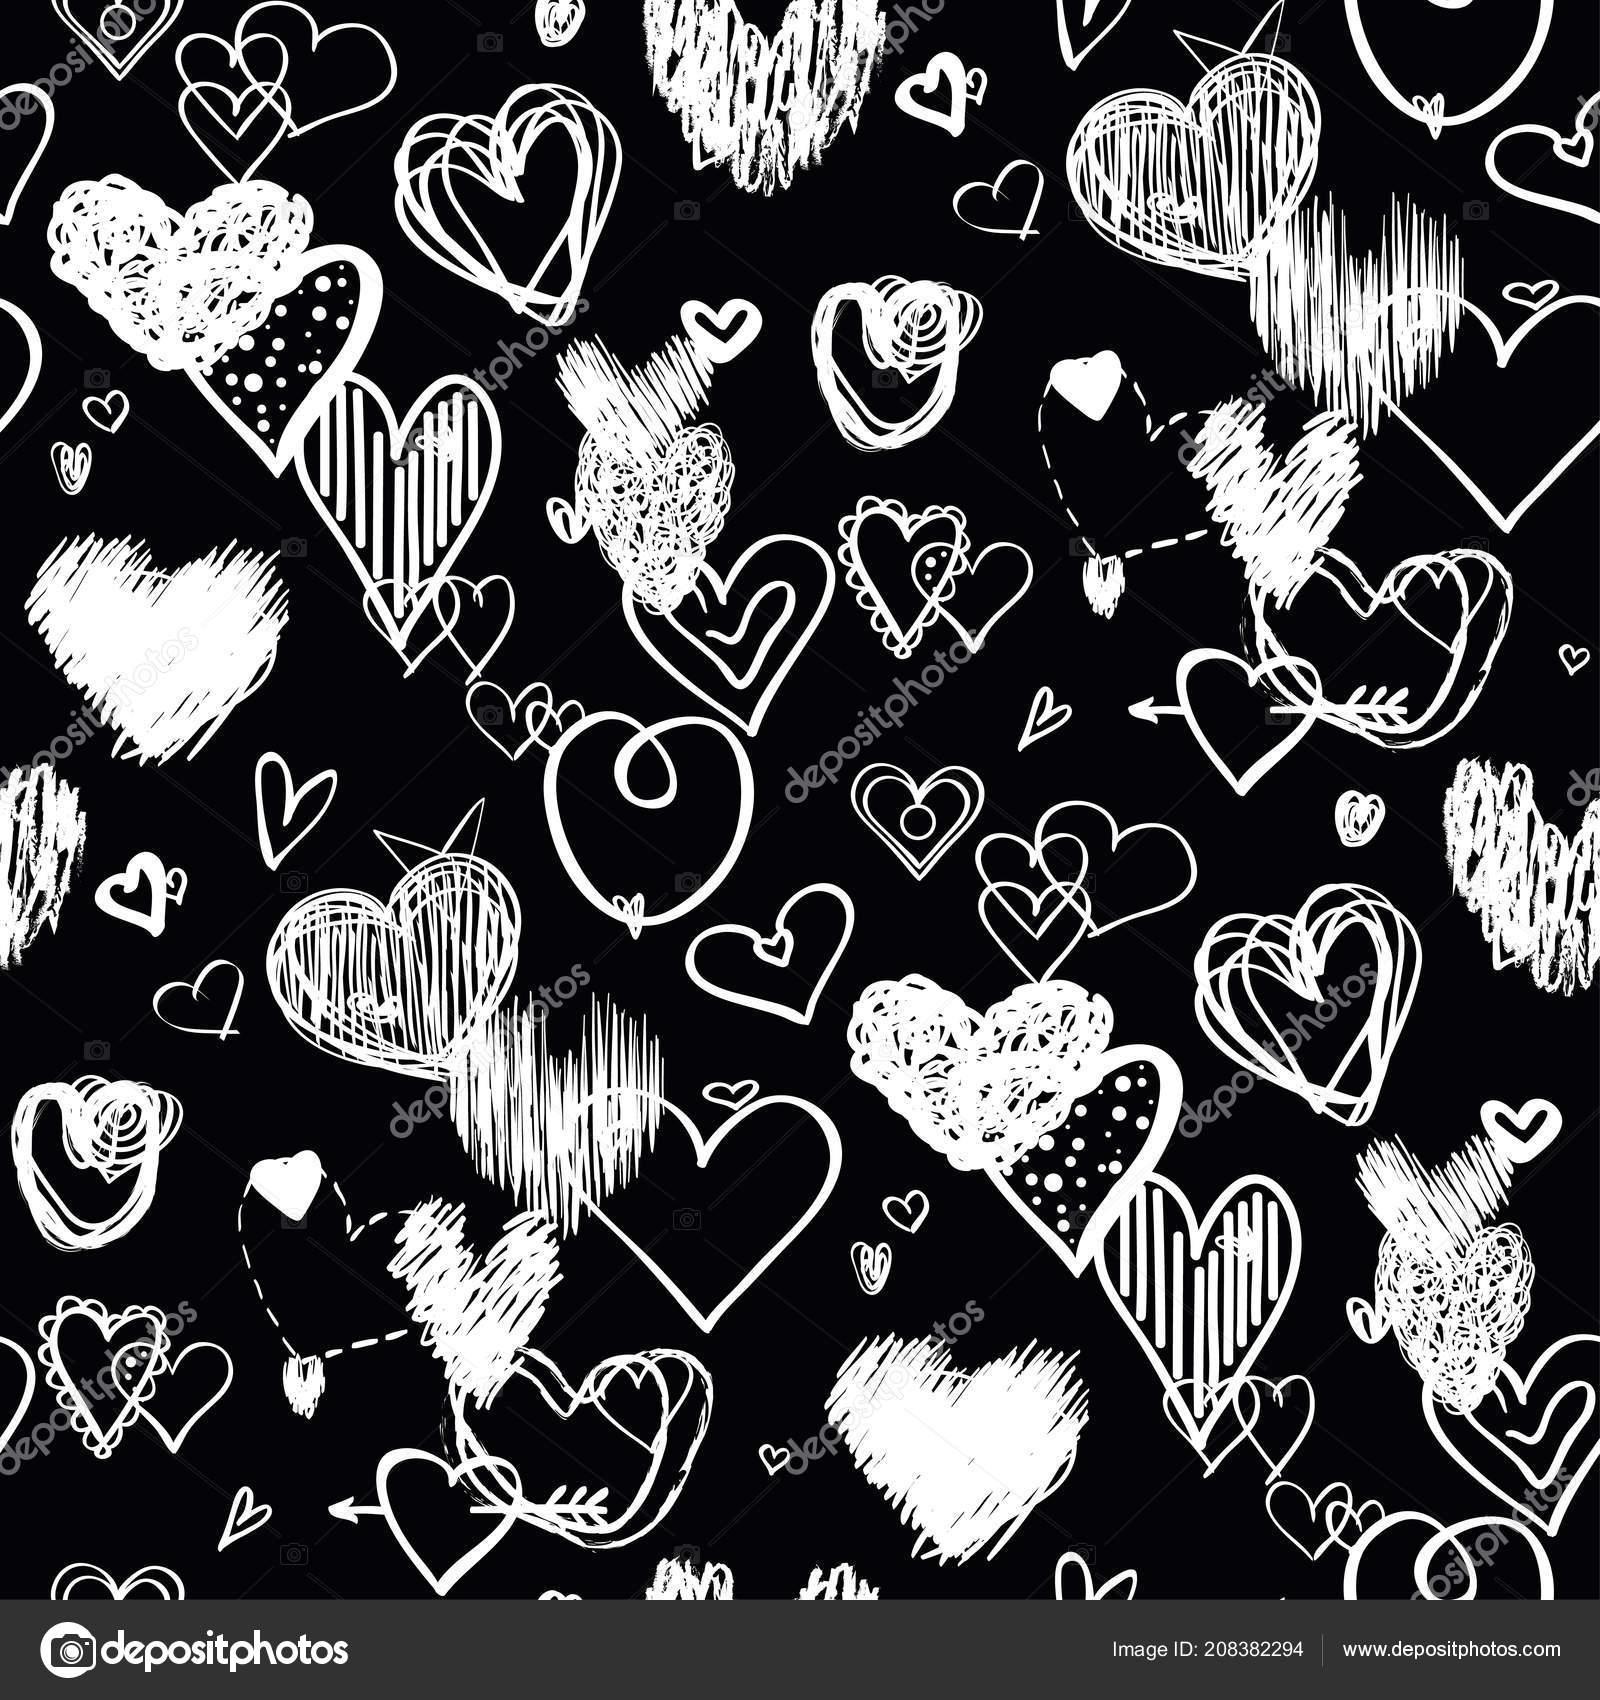 Black Love Art Wallpaper Hearts Black Background Abstract